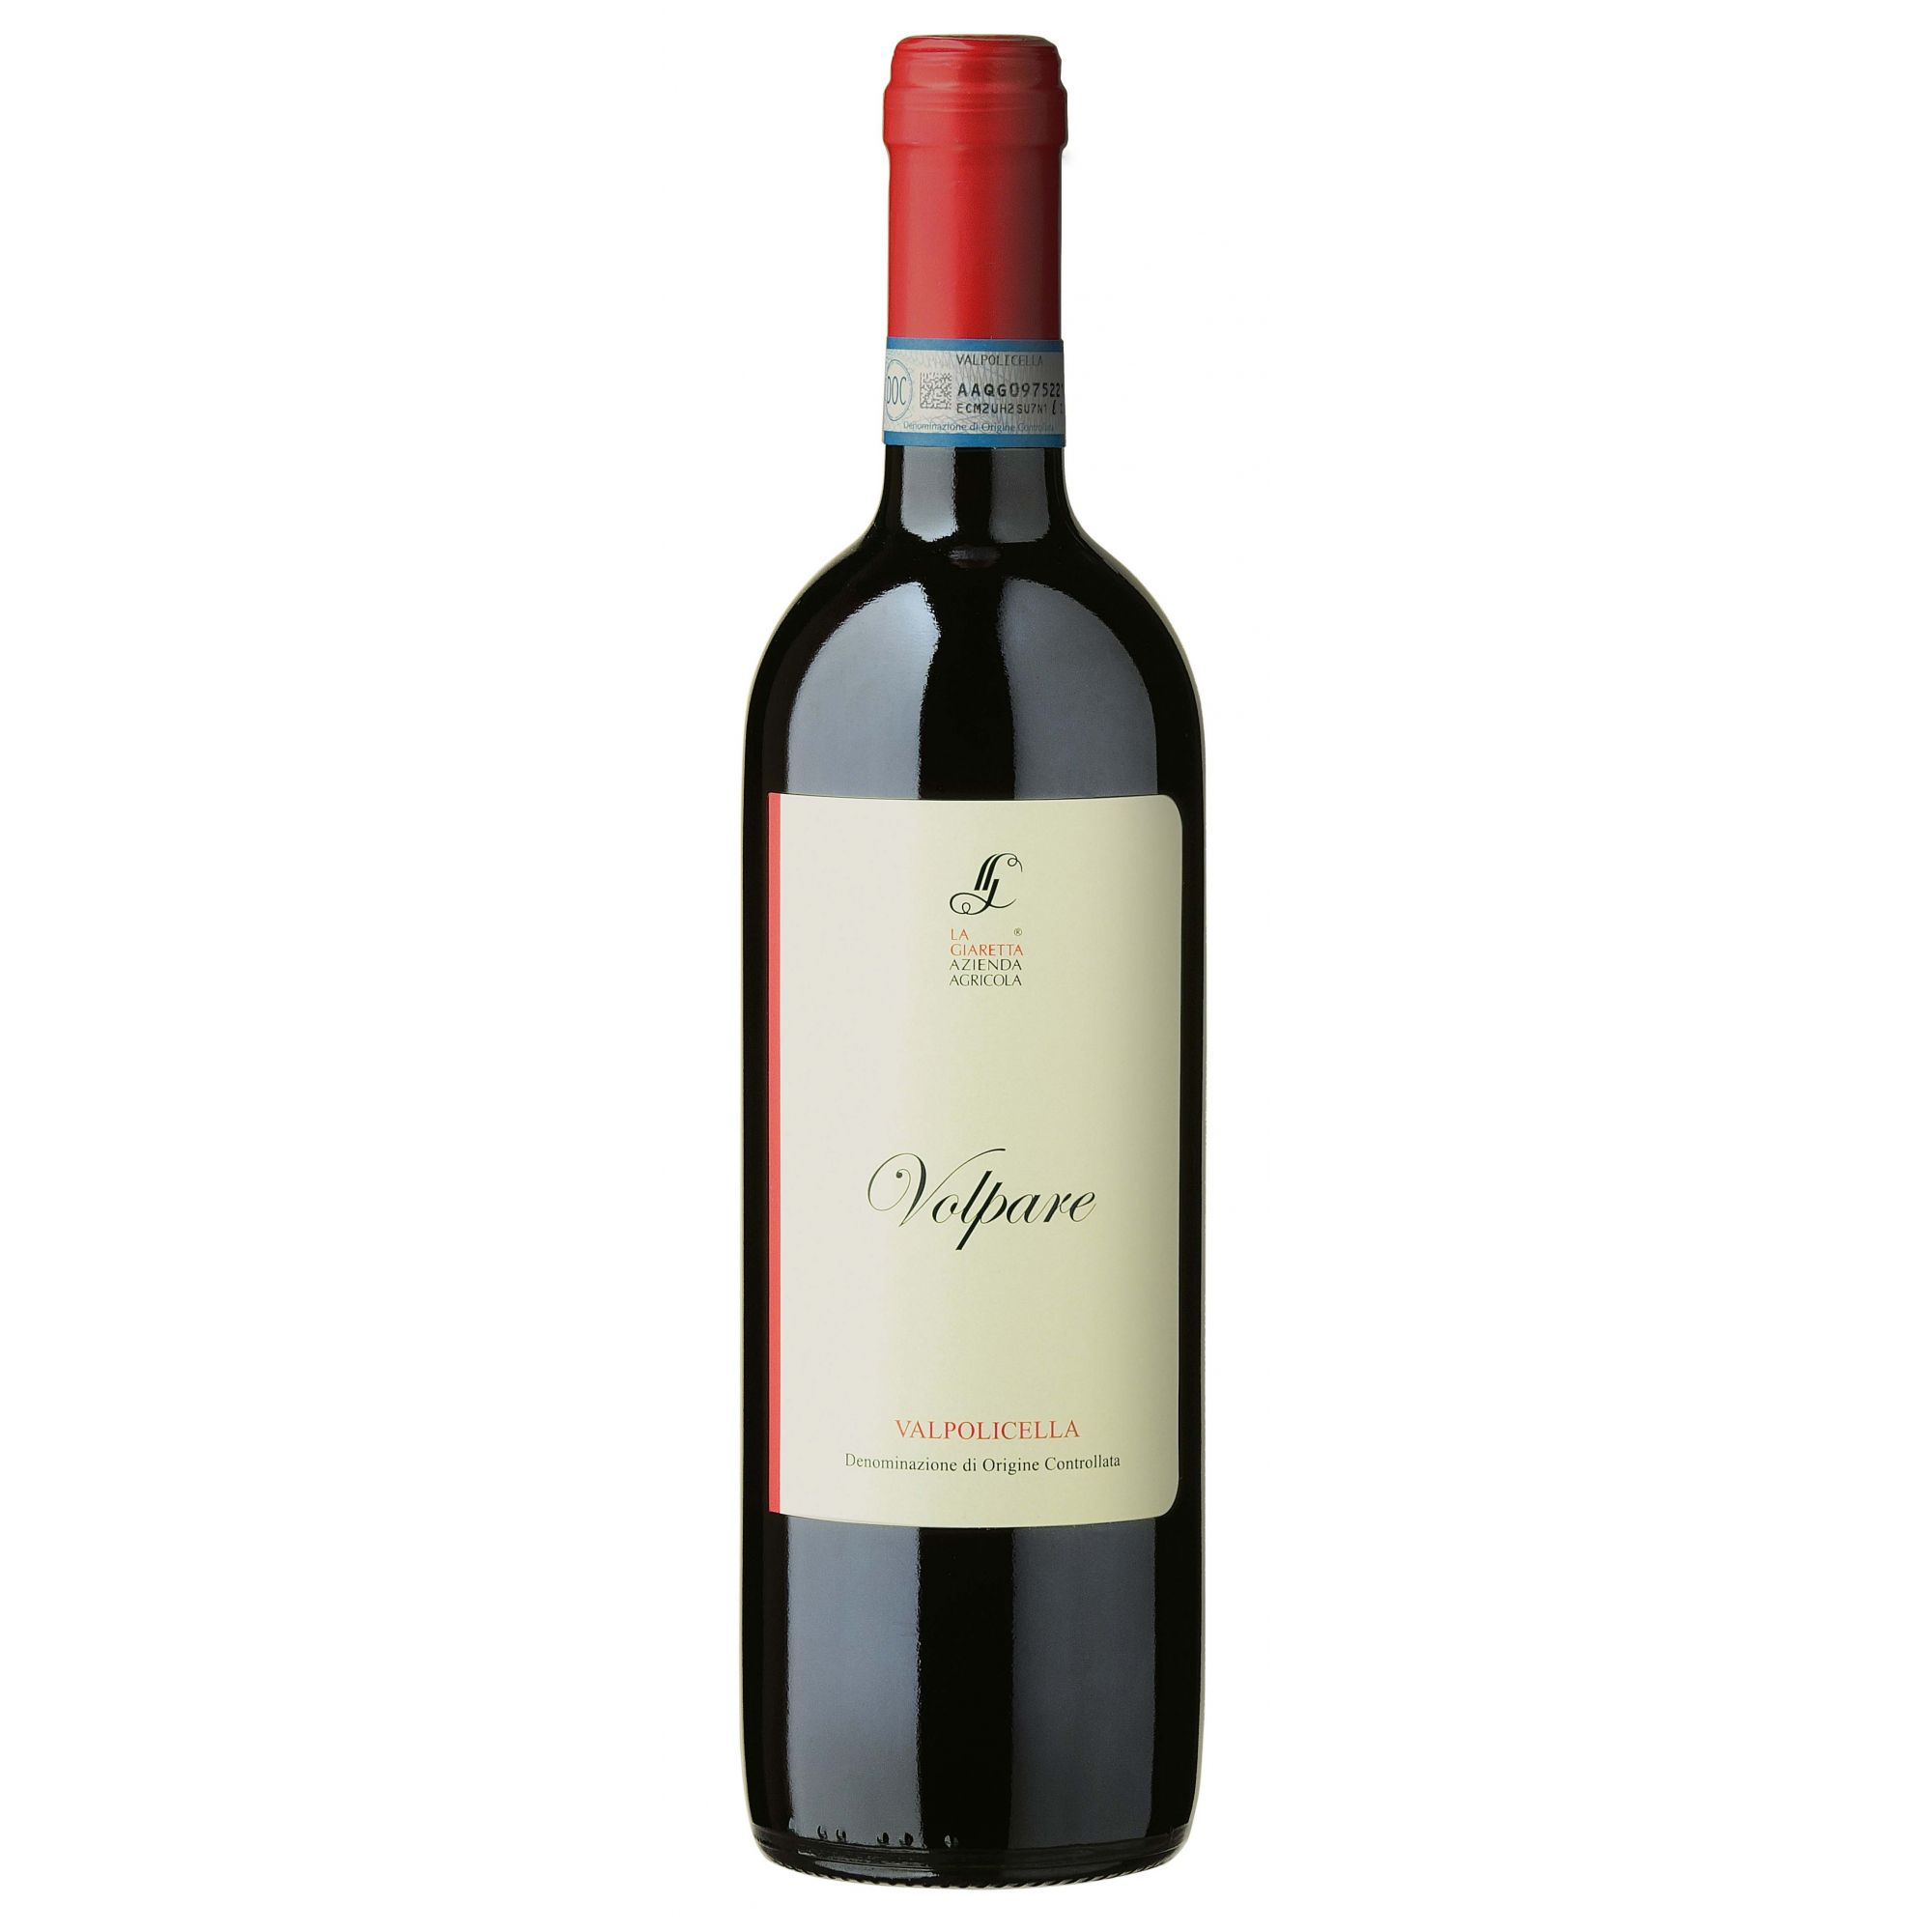 Vinho La Giaretta Valpolicella Volpare 2017